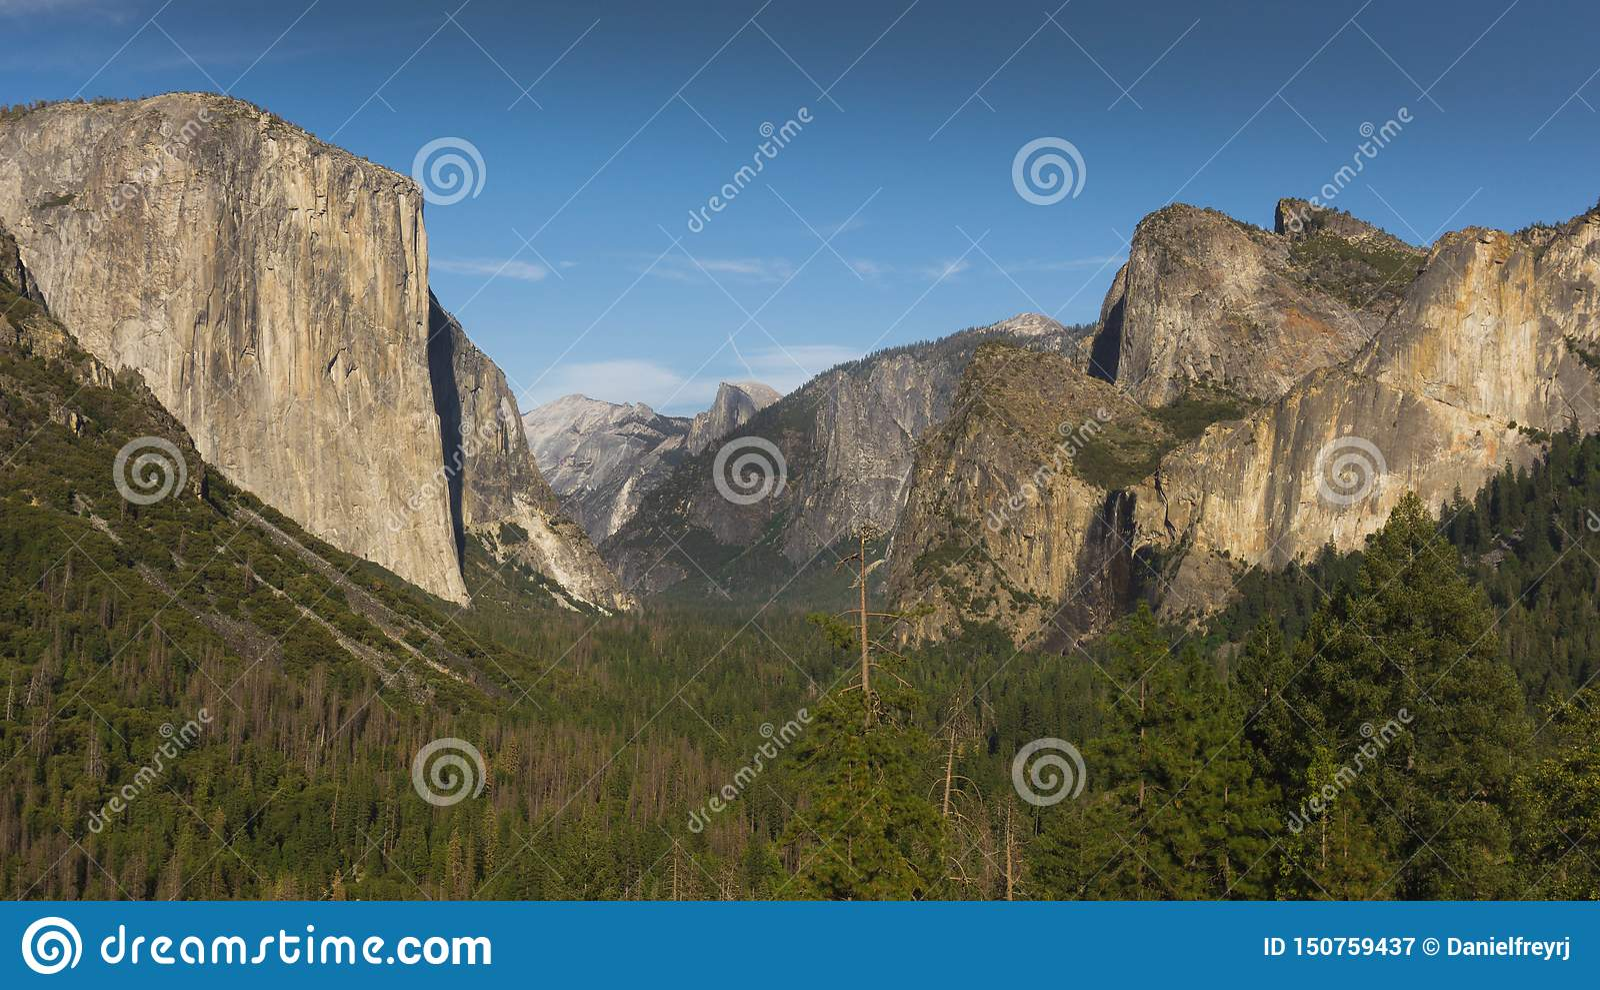 Den iconic Yosemite tunnelsikten, Kalifornien